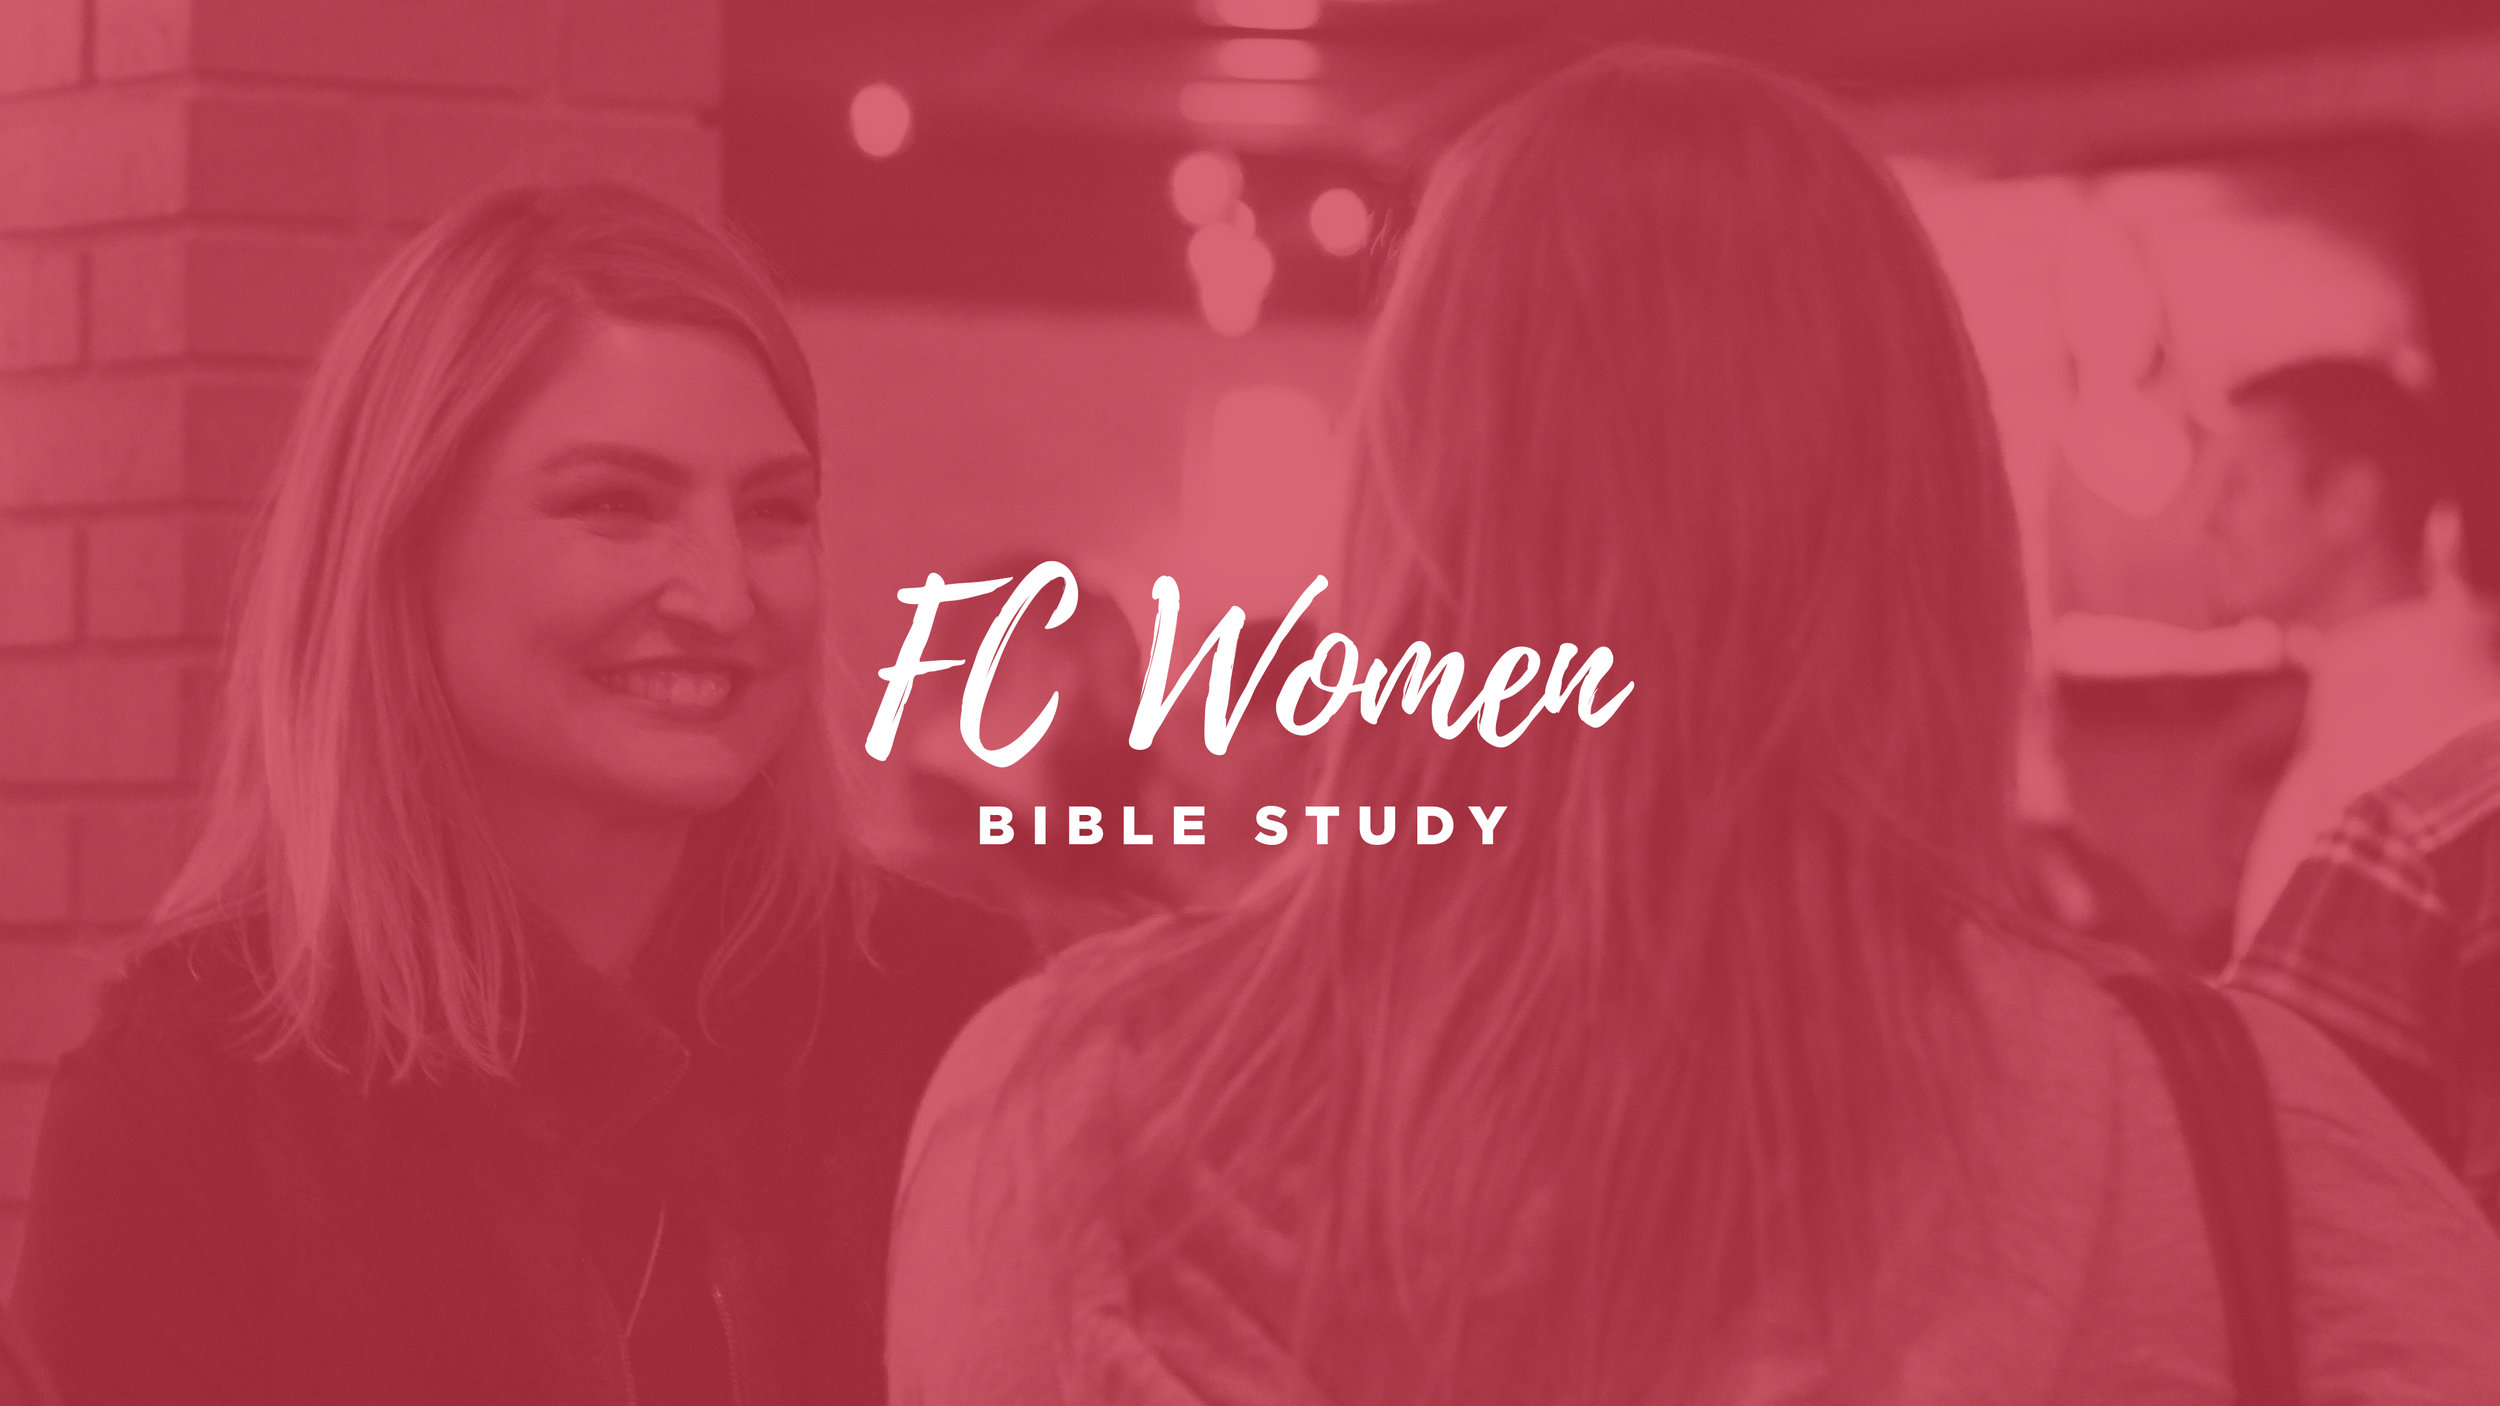 Foundations Church Women Bible Study